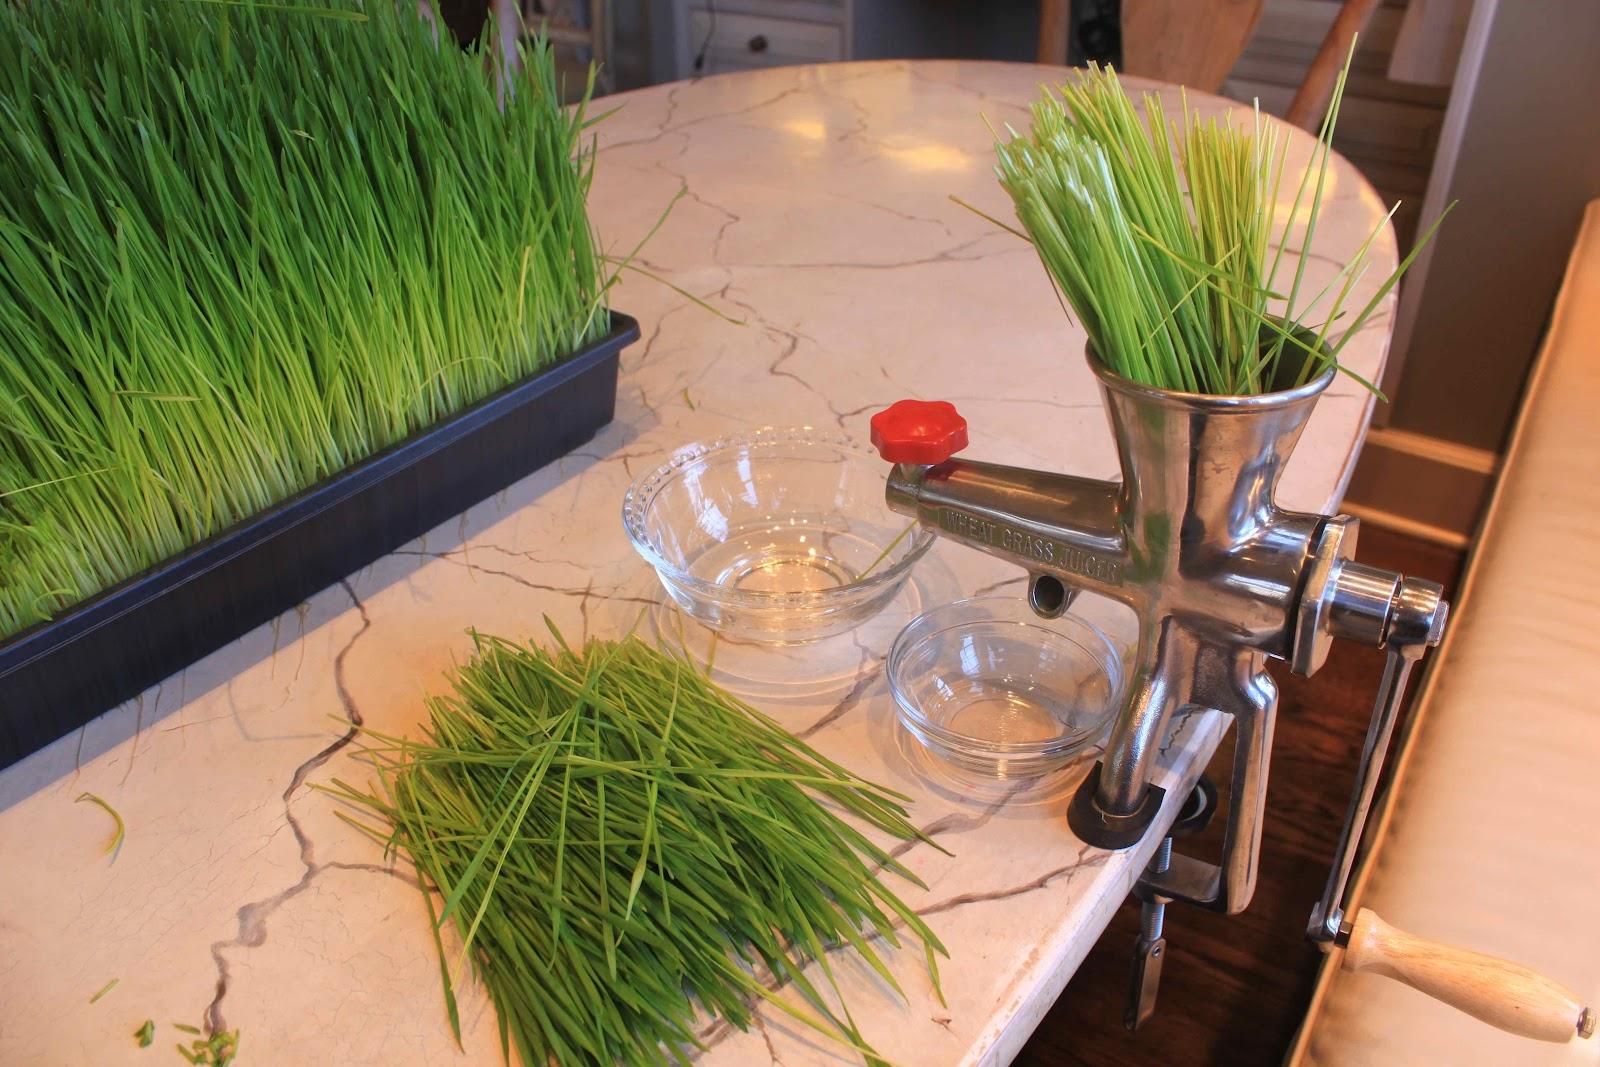 European Cutie Shots Shots Shots Healthy Wheatgrass